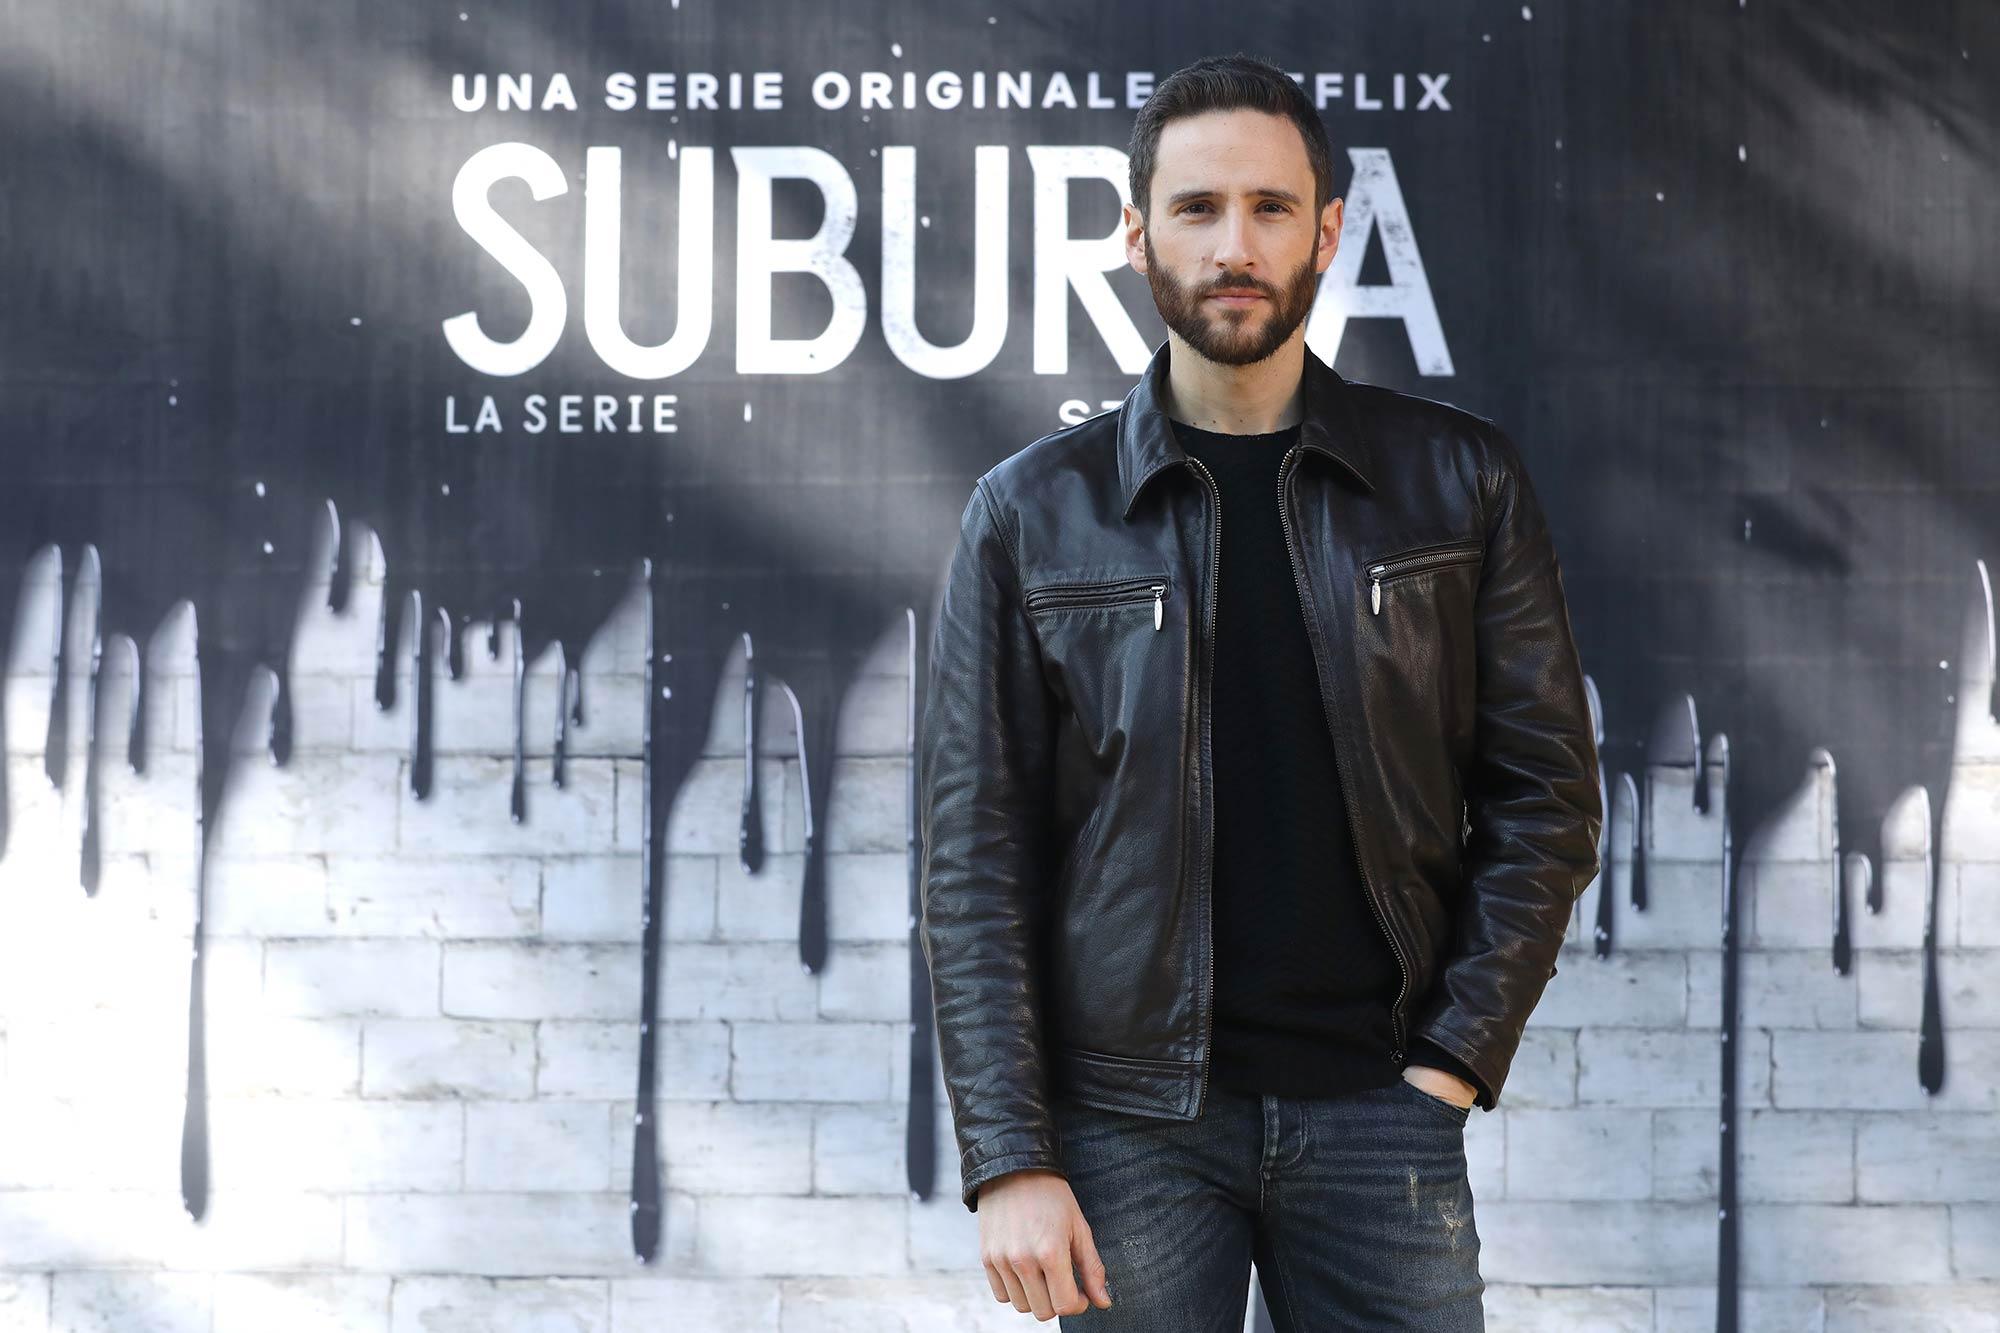 Netflix Premiere Suburra 2 - Jacopo Venturiero - Grooming Massimo Serini Team